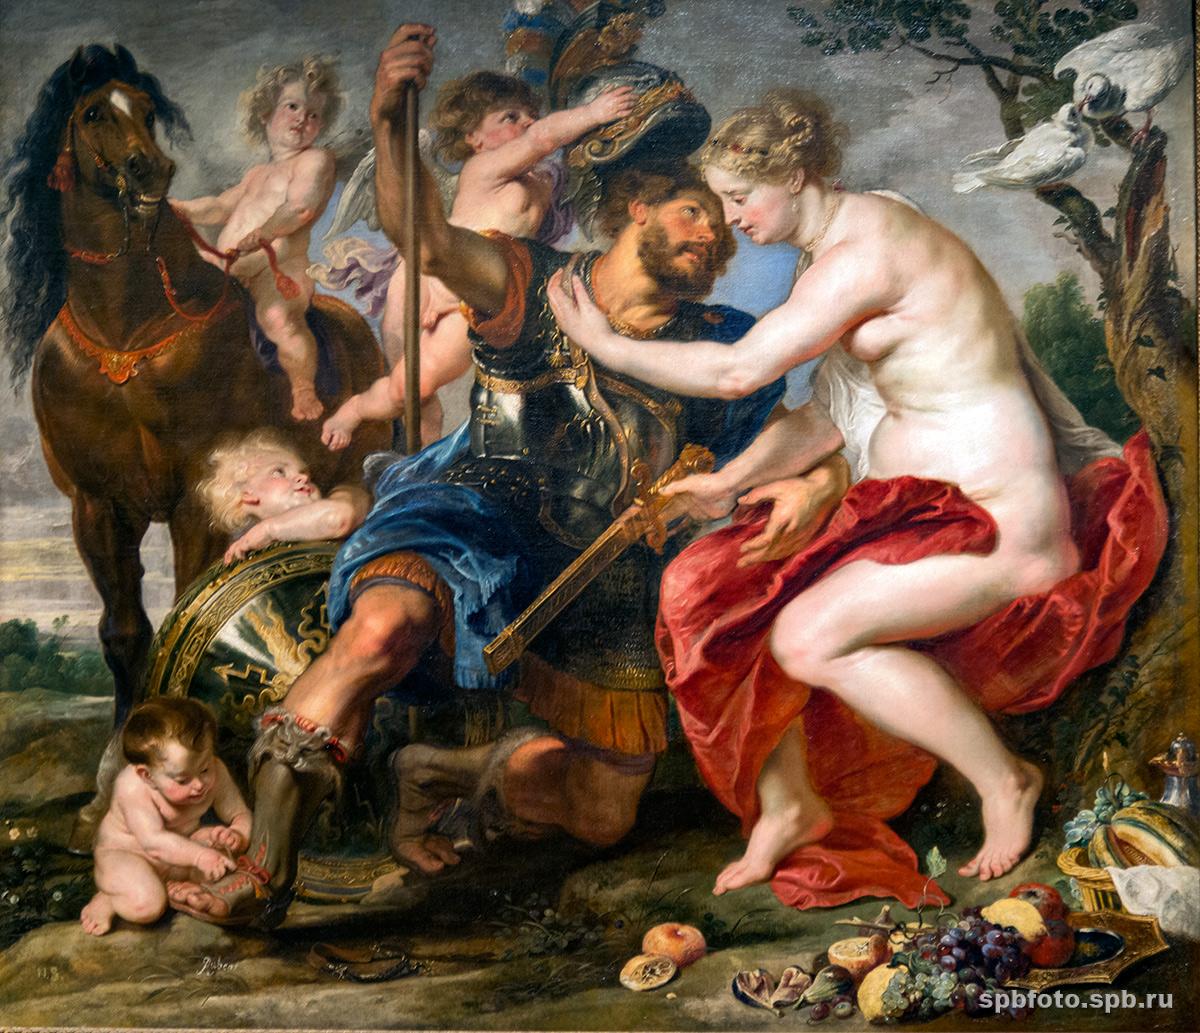 Марс и Венера. Питер Пауль Рубенс, 1622–1625 годы, источник фото: http://spbfoto.spb.ru/foto/details.php?image_id=1198